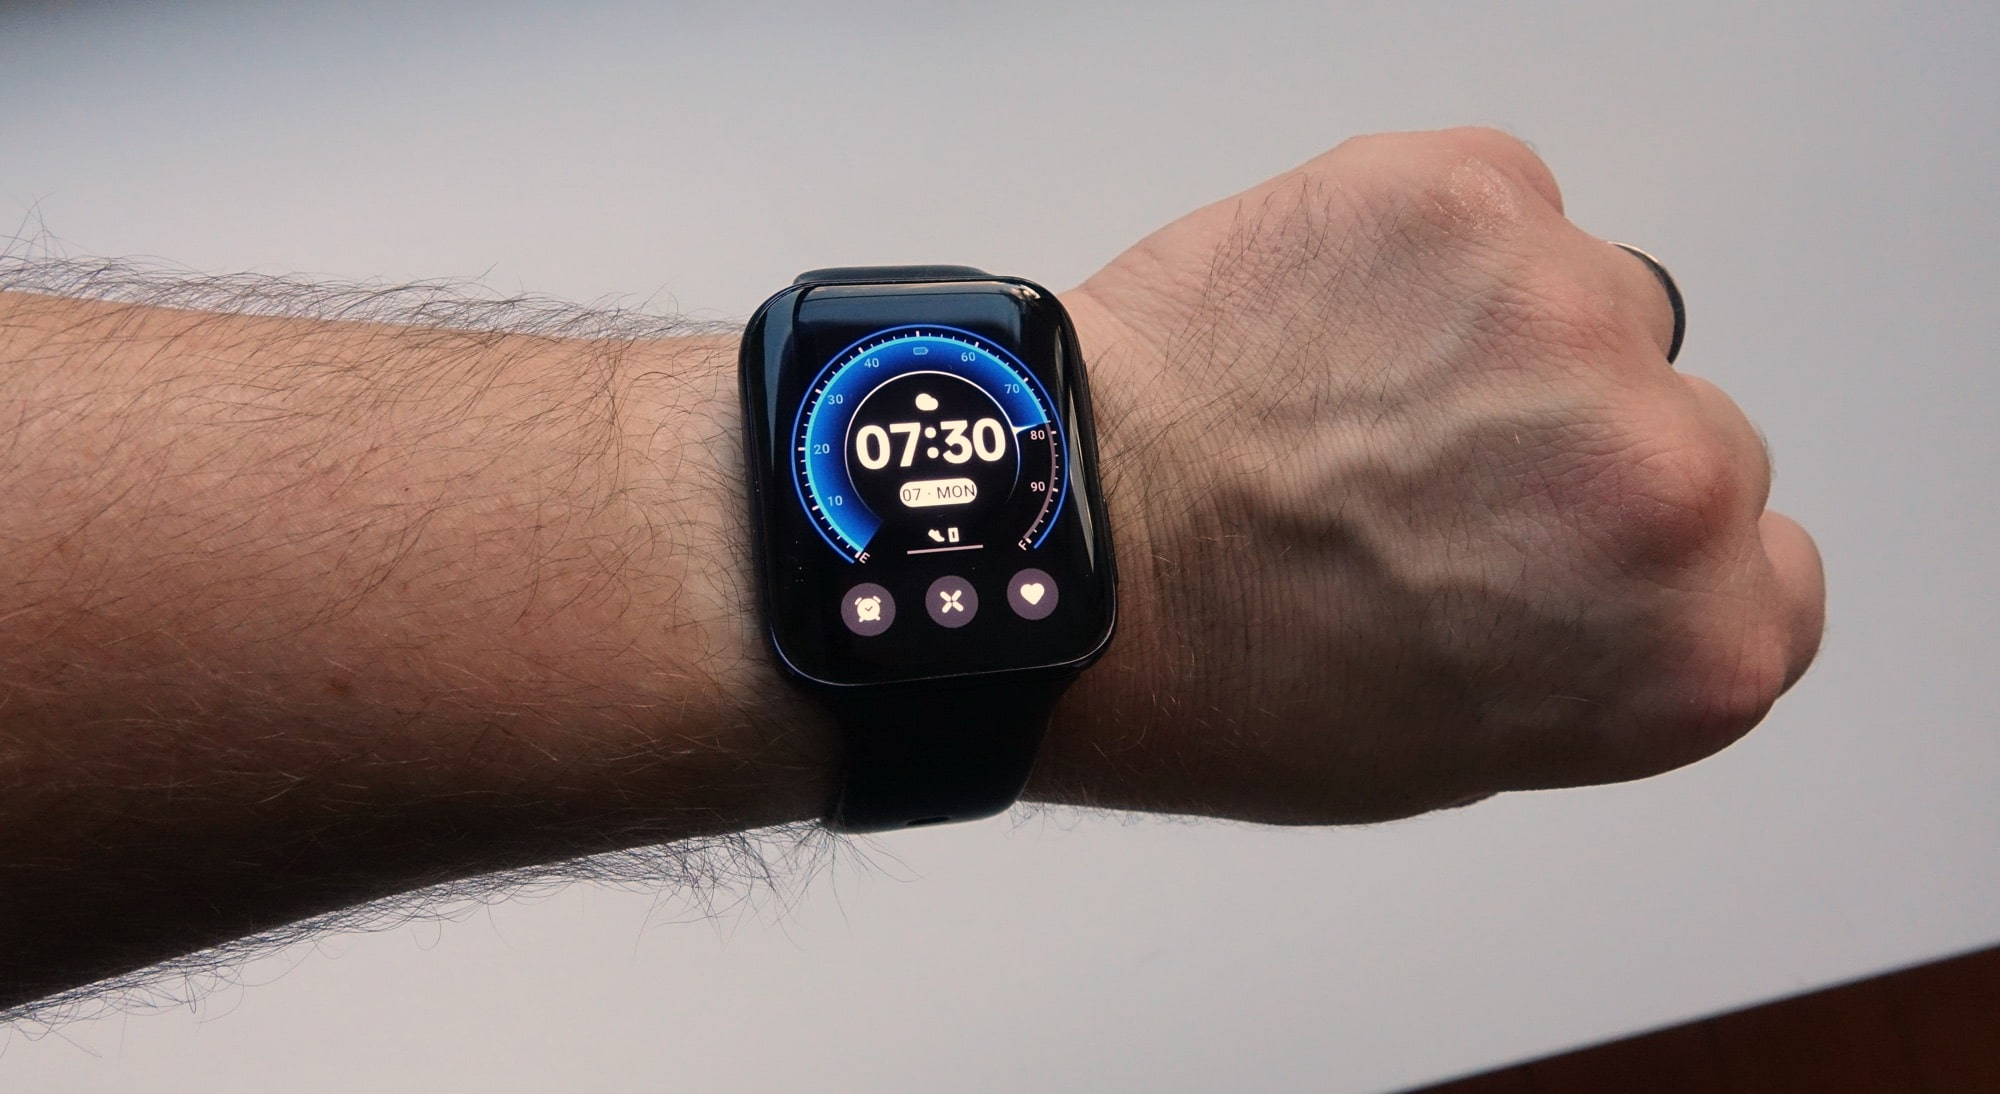 Wearing the Oppo Watch